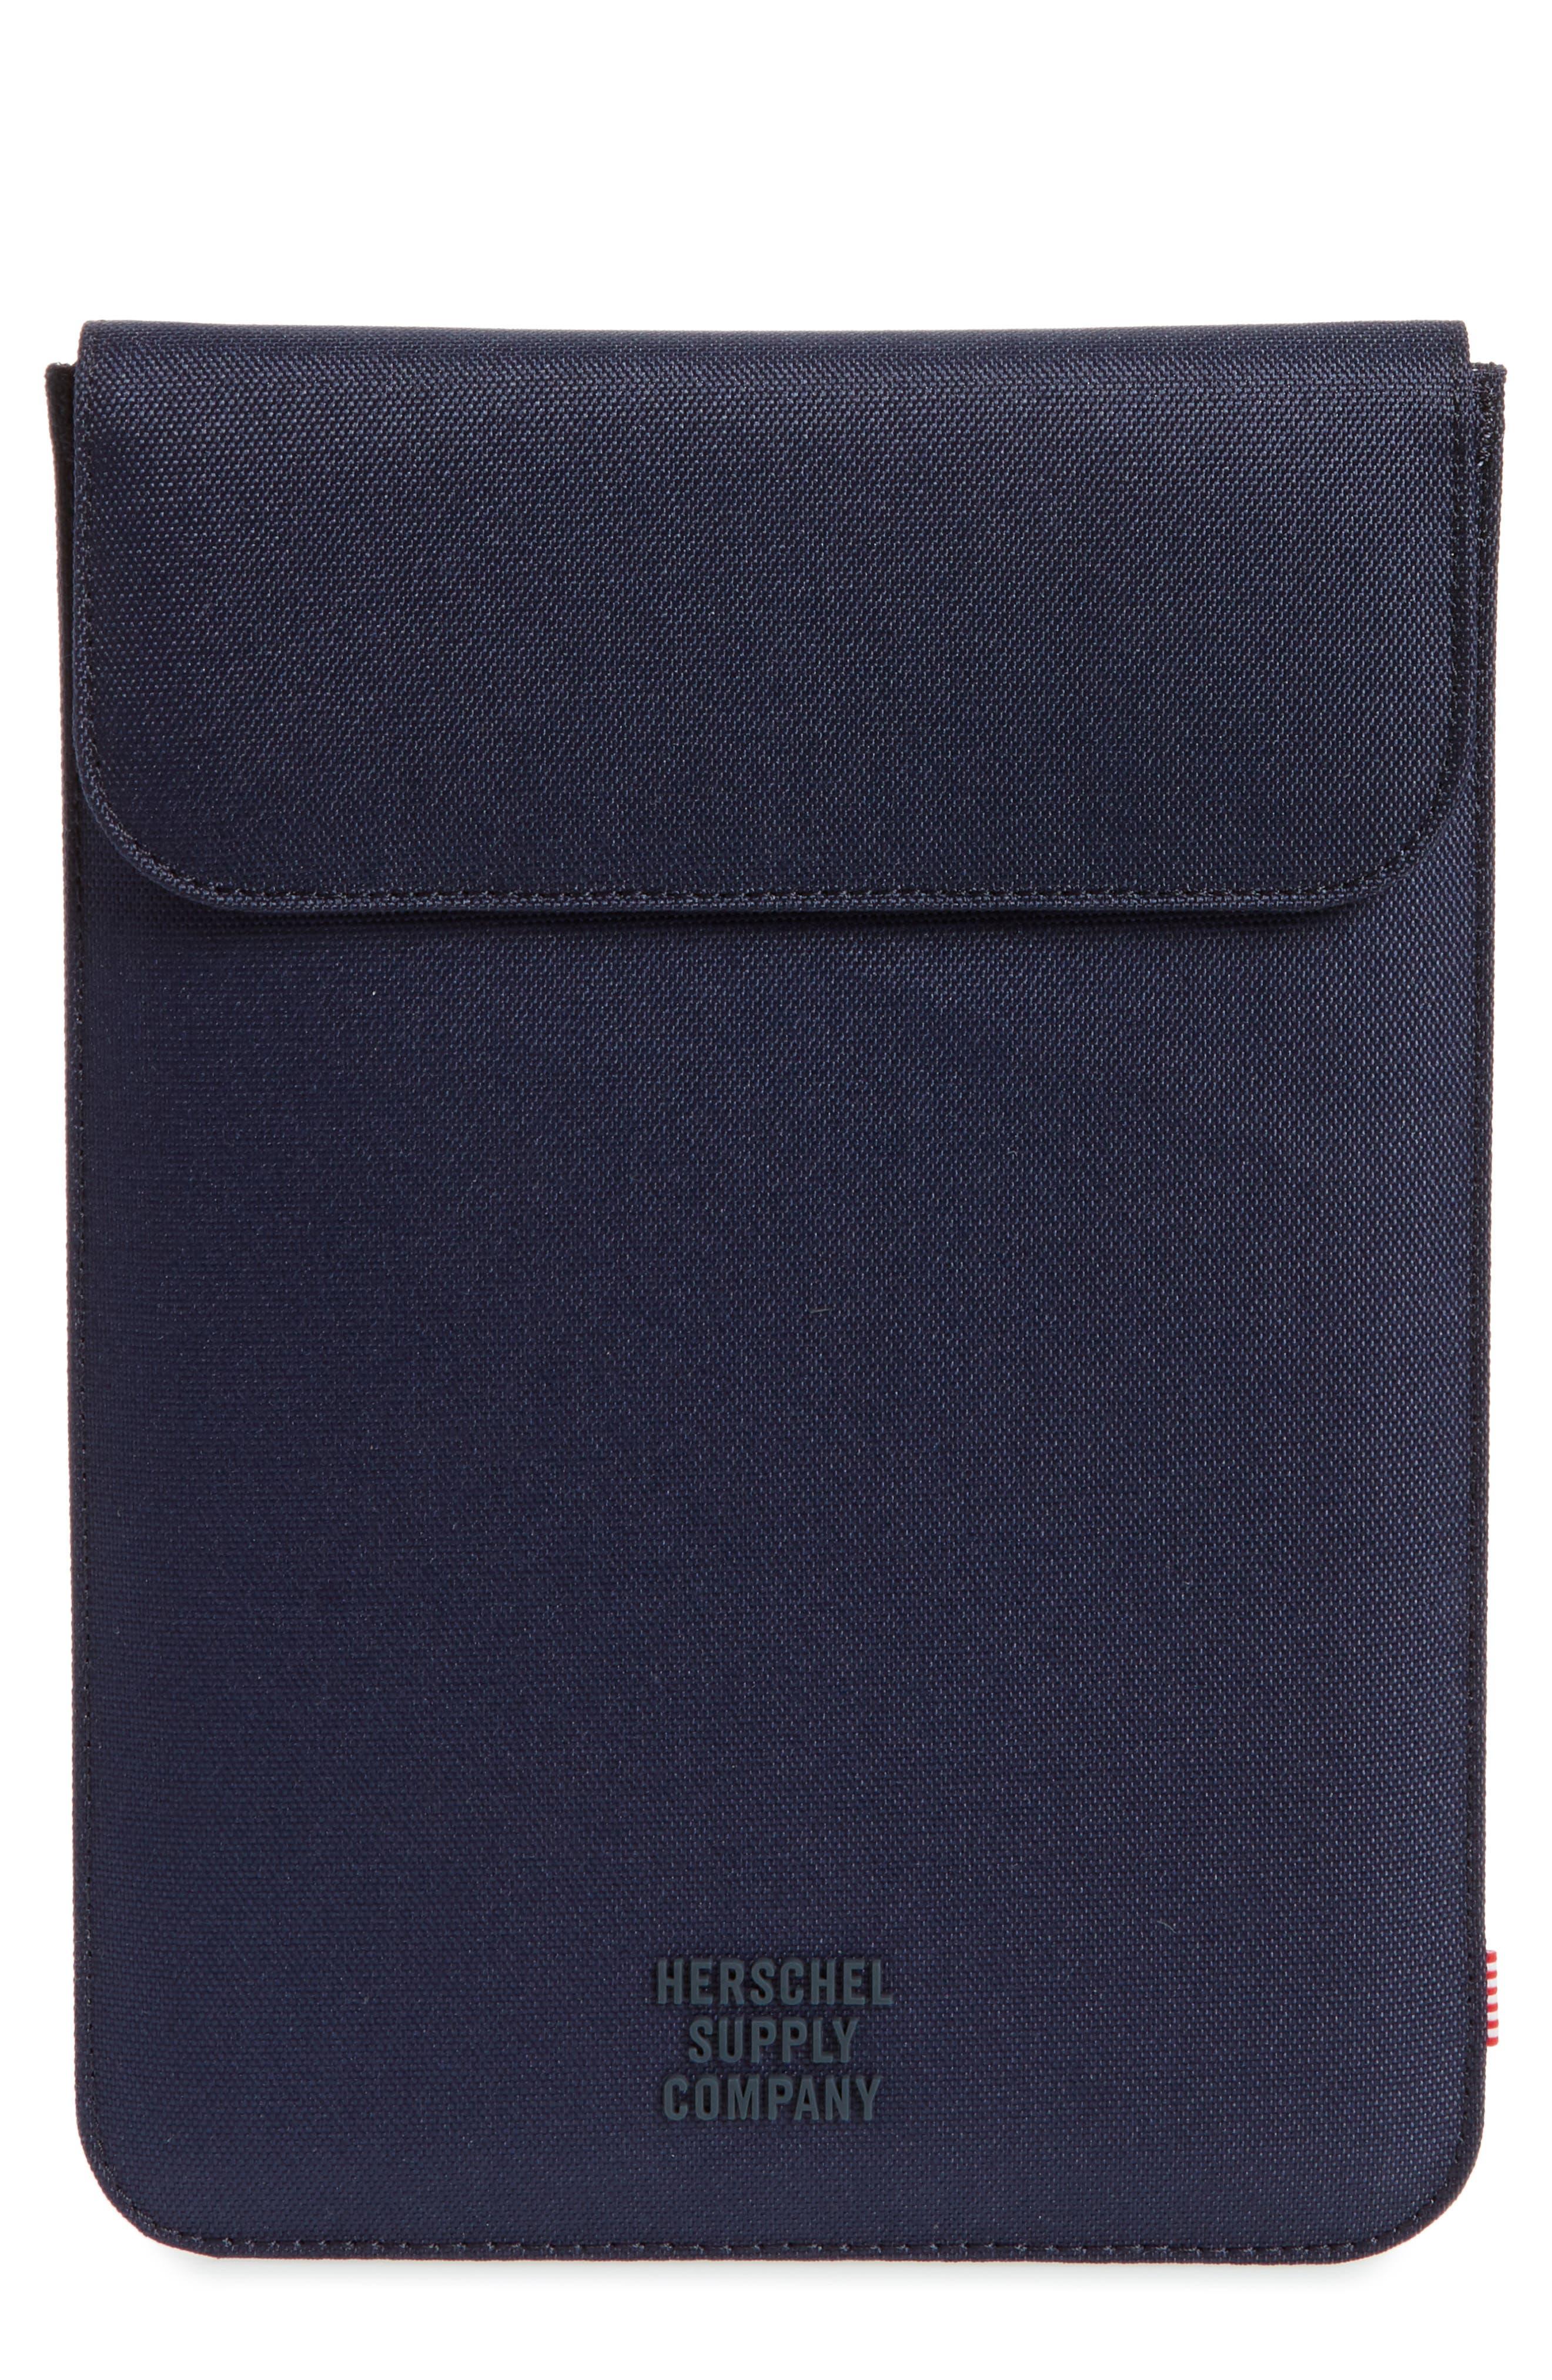 Spokane iPad Air Canvas Sleeve,                             Main thumbnail 1, color,                             Peacoat/ Light Grey